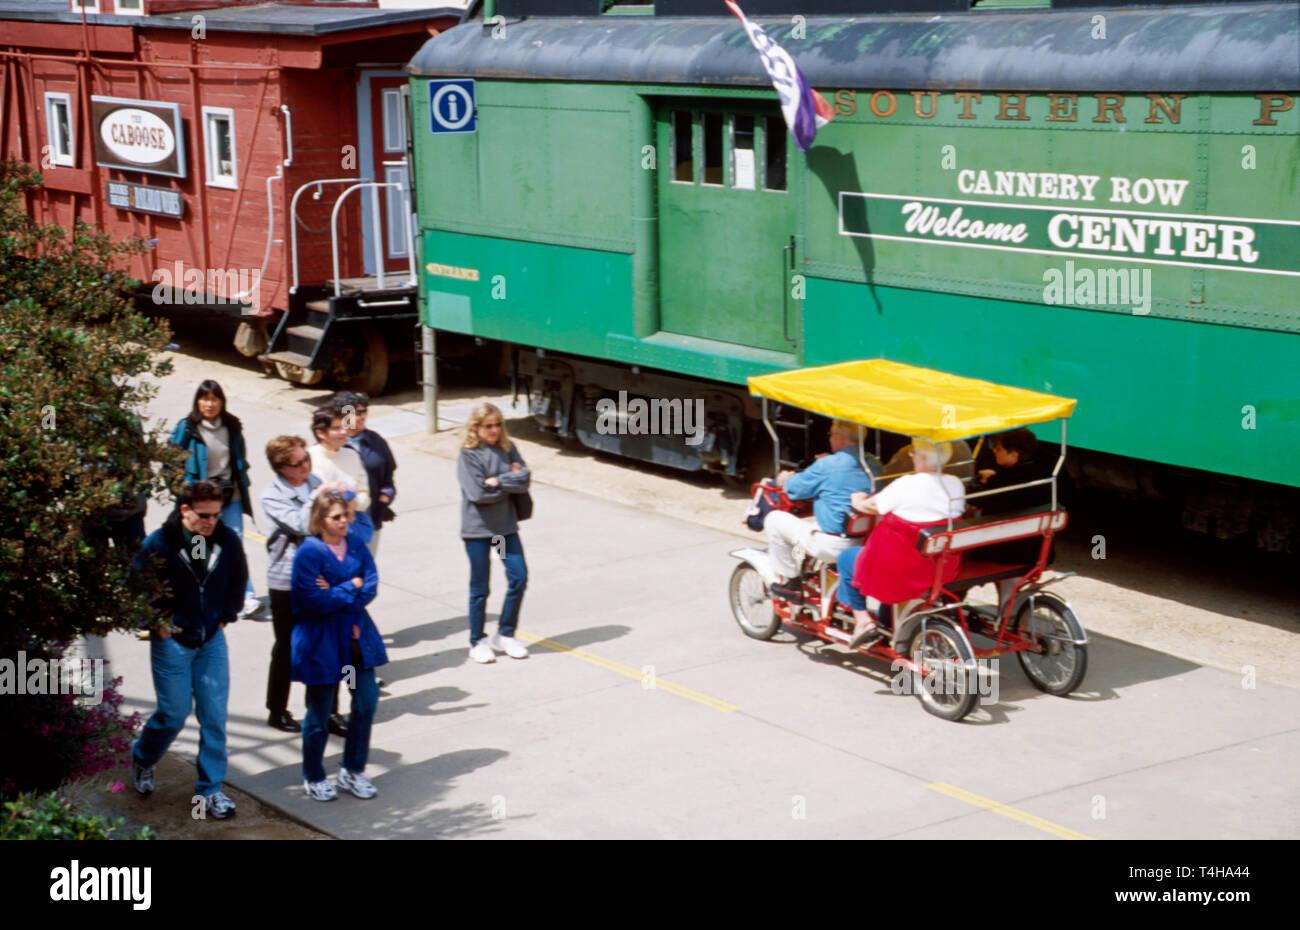 California Monterey Peninsula Recreational Trail near Cannery Row rental peddle jitneys - Stock Image